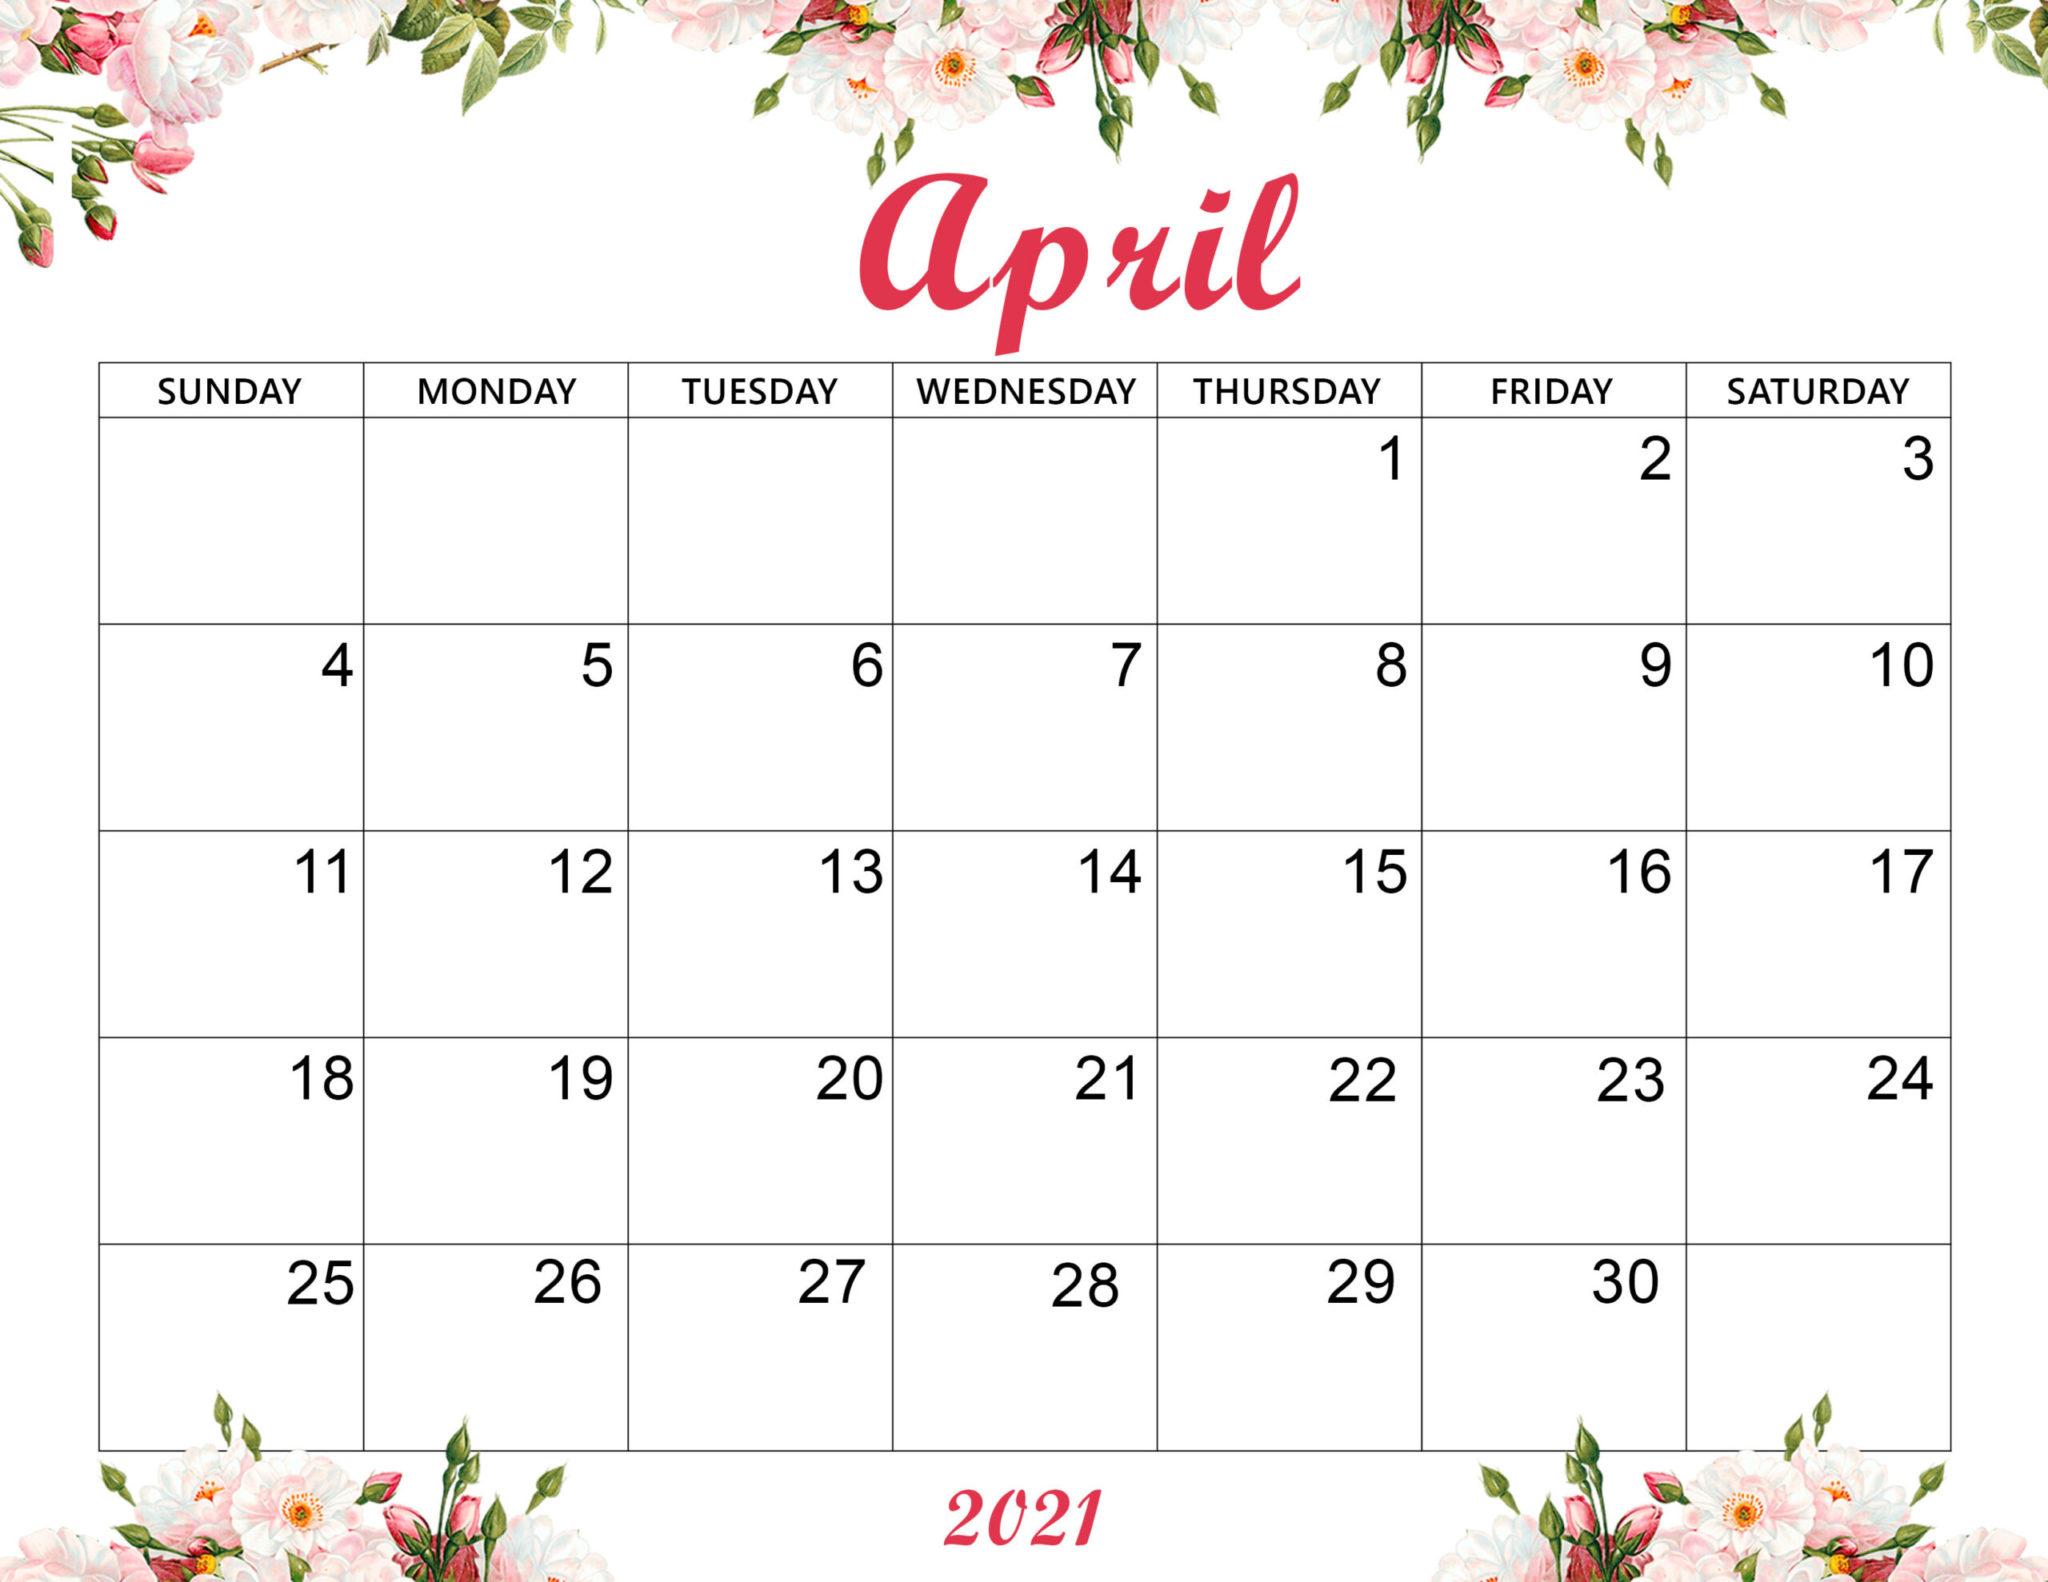 Cute April 2021 Calendar For Desk